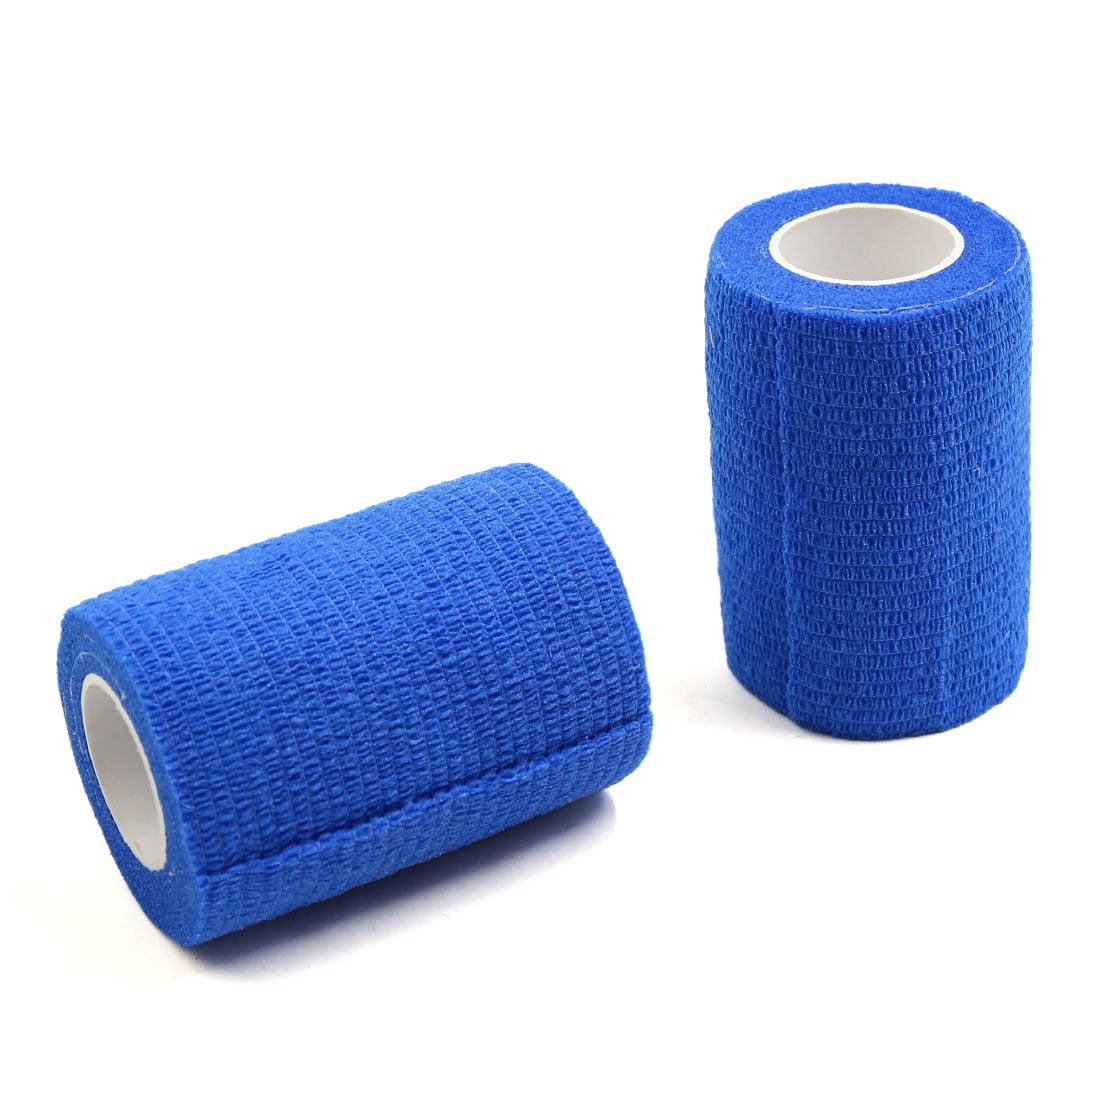 2 Pcs Athletic Sports Cotton Tape Ankle Knee Wrist Self Adhesive Tape